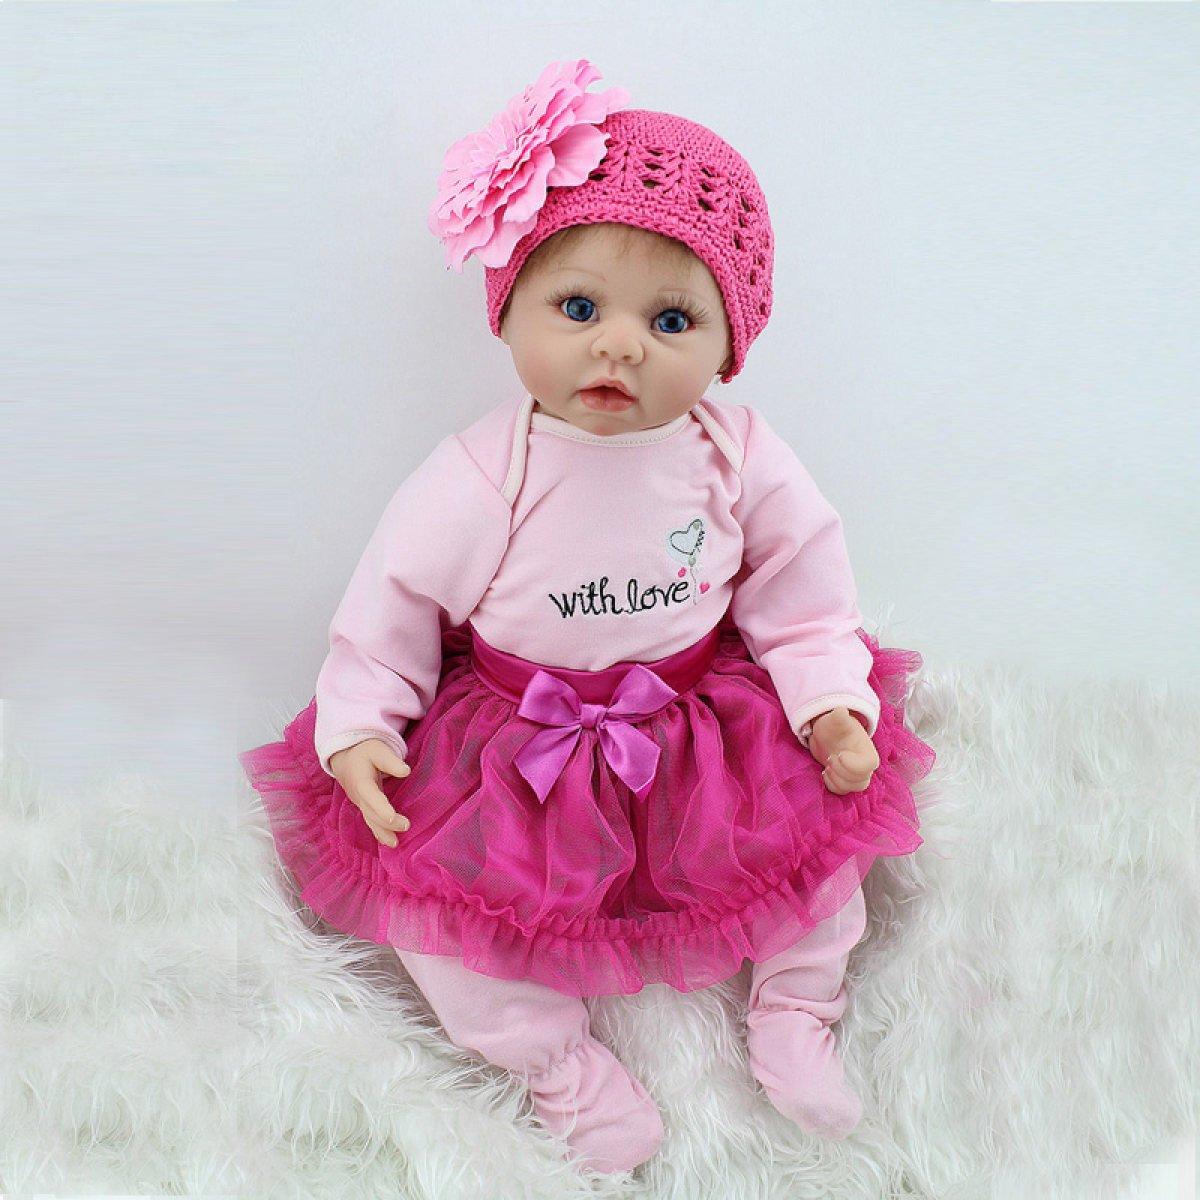 Yihang Rebornボディシリコンビニール人形Sleeping Boy Babies 22インチ55 cmフルAlive Baby Realビニールベリーキッズおもちゃ子供誕生日ギフト   B07BTMMV93